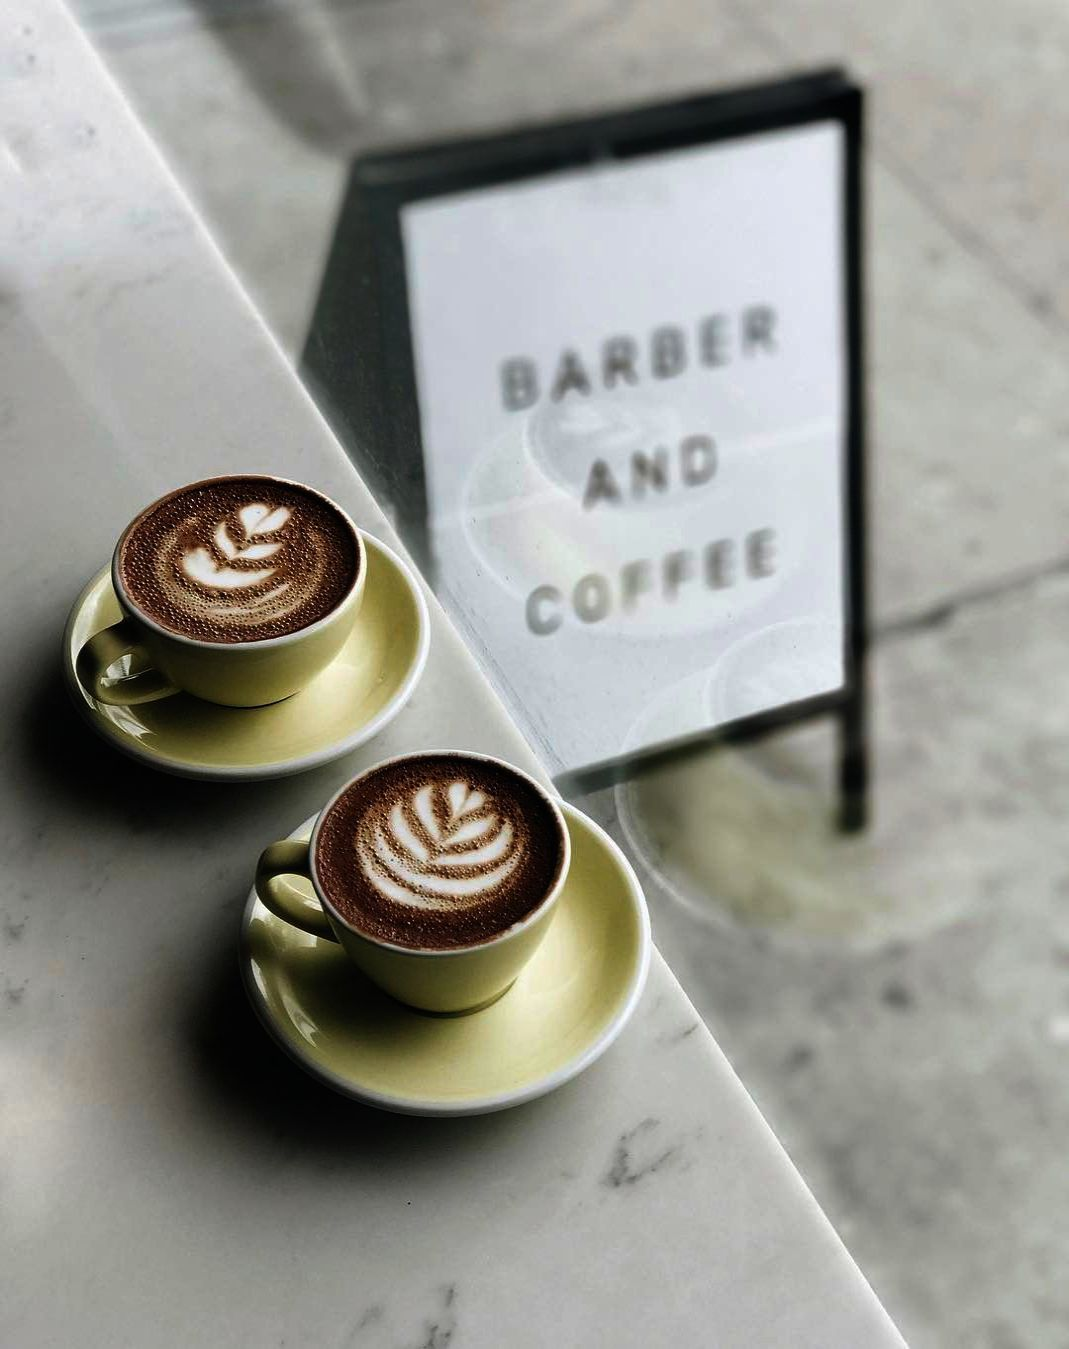 Coffee Meets Bagel Ipo Through Coffee Bean And Tea Leaf Kauai Coffee Recipes Coffee Tasting Single Serve Coffee Makers